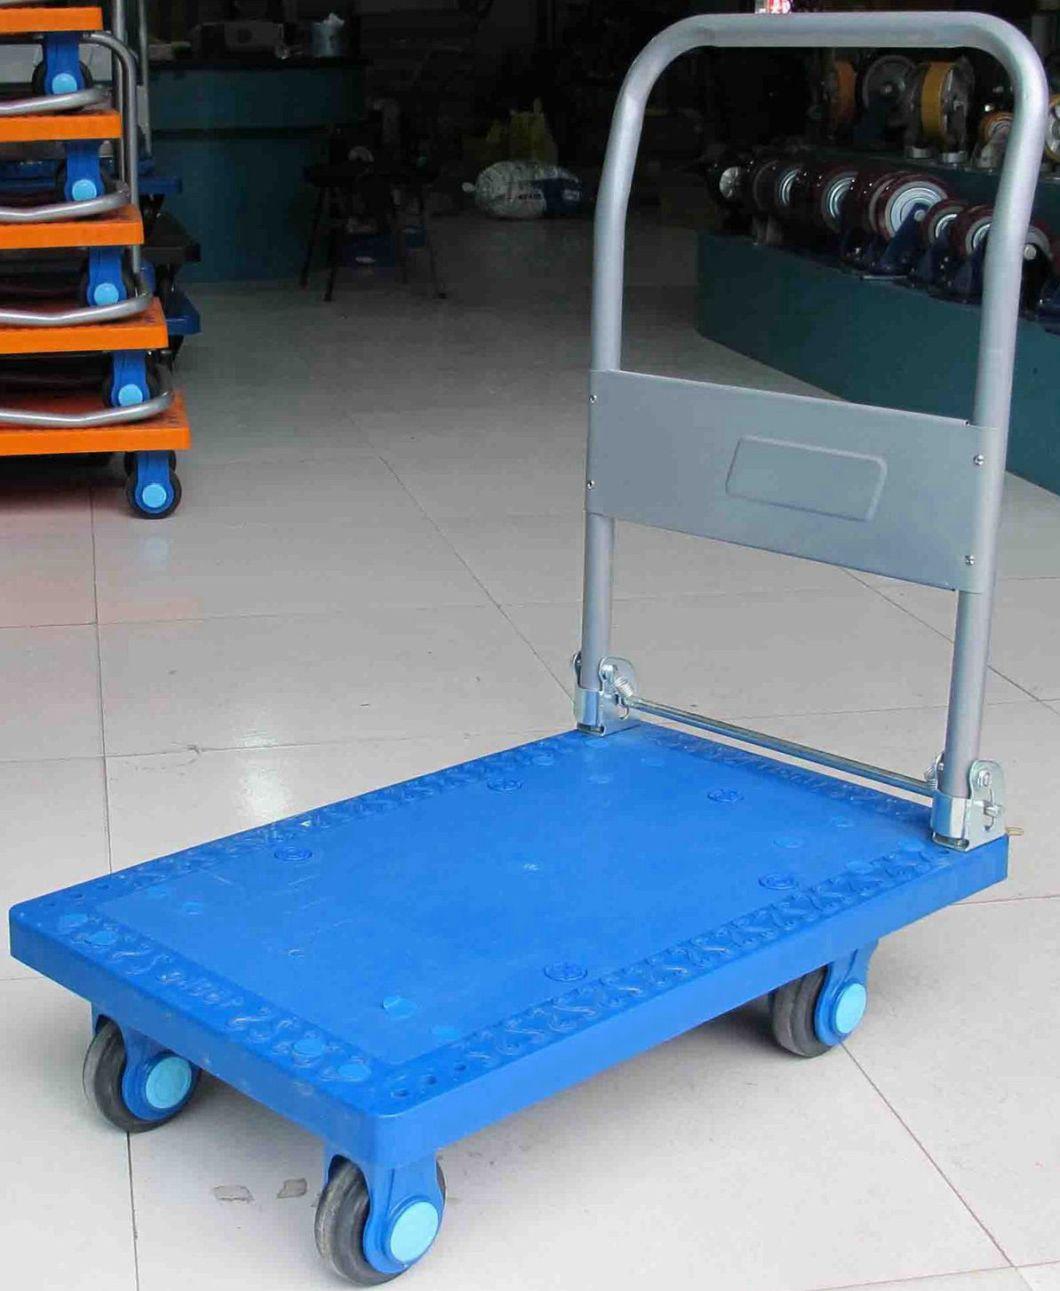 150kg High Quality Plastic Platform Hand Cart Folding Pallet Industrial Trolley